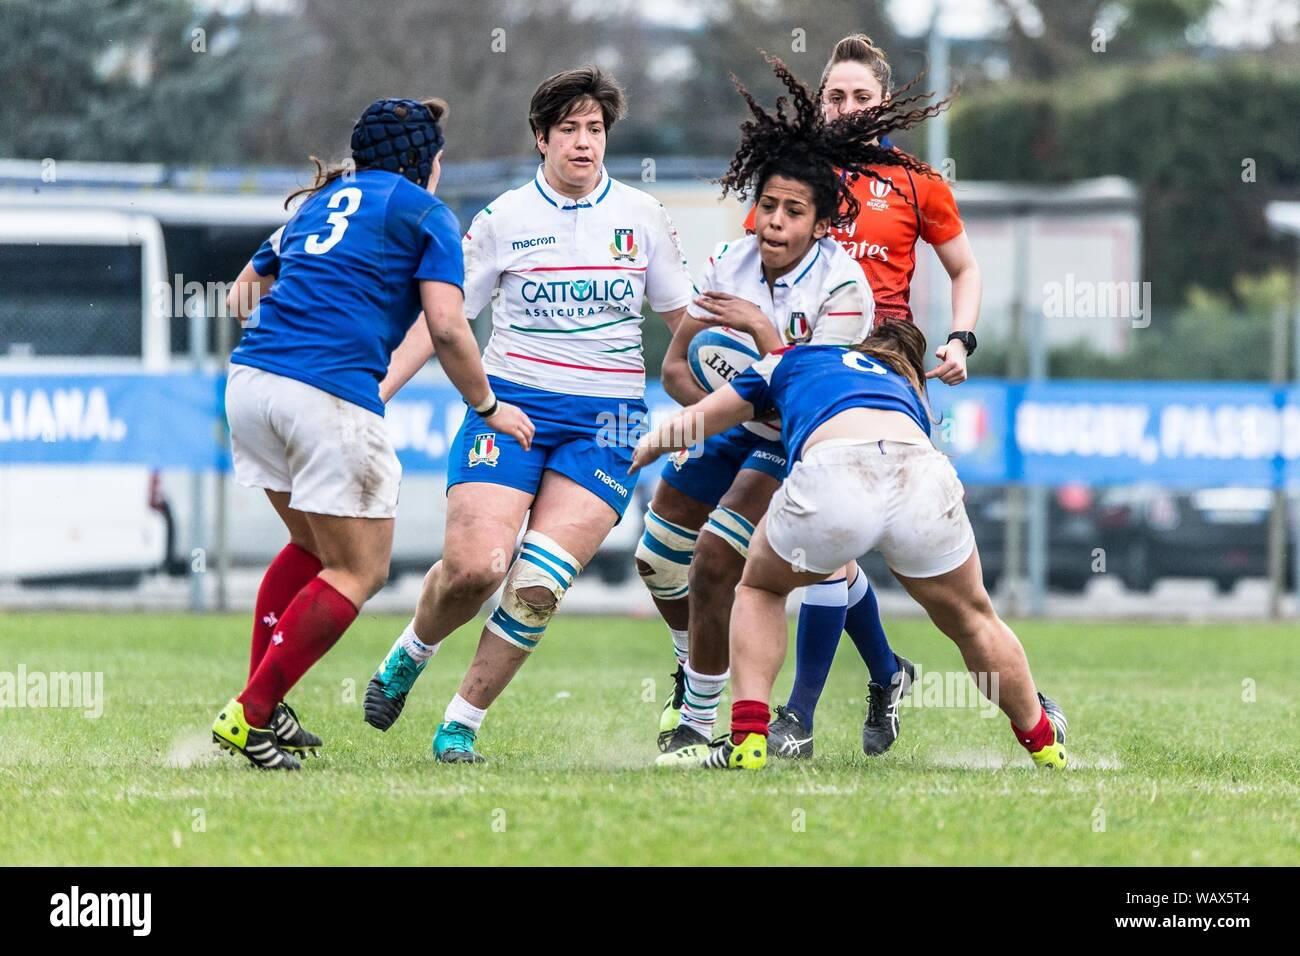 Giada Franco during ITALIA VS FRANCIA - SEI NAZIONI FEMMINILE, Padova, Italy,  17 Mar 2019, Rugby Nazionale Italiana di Rugby Stock Photo - Alamy